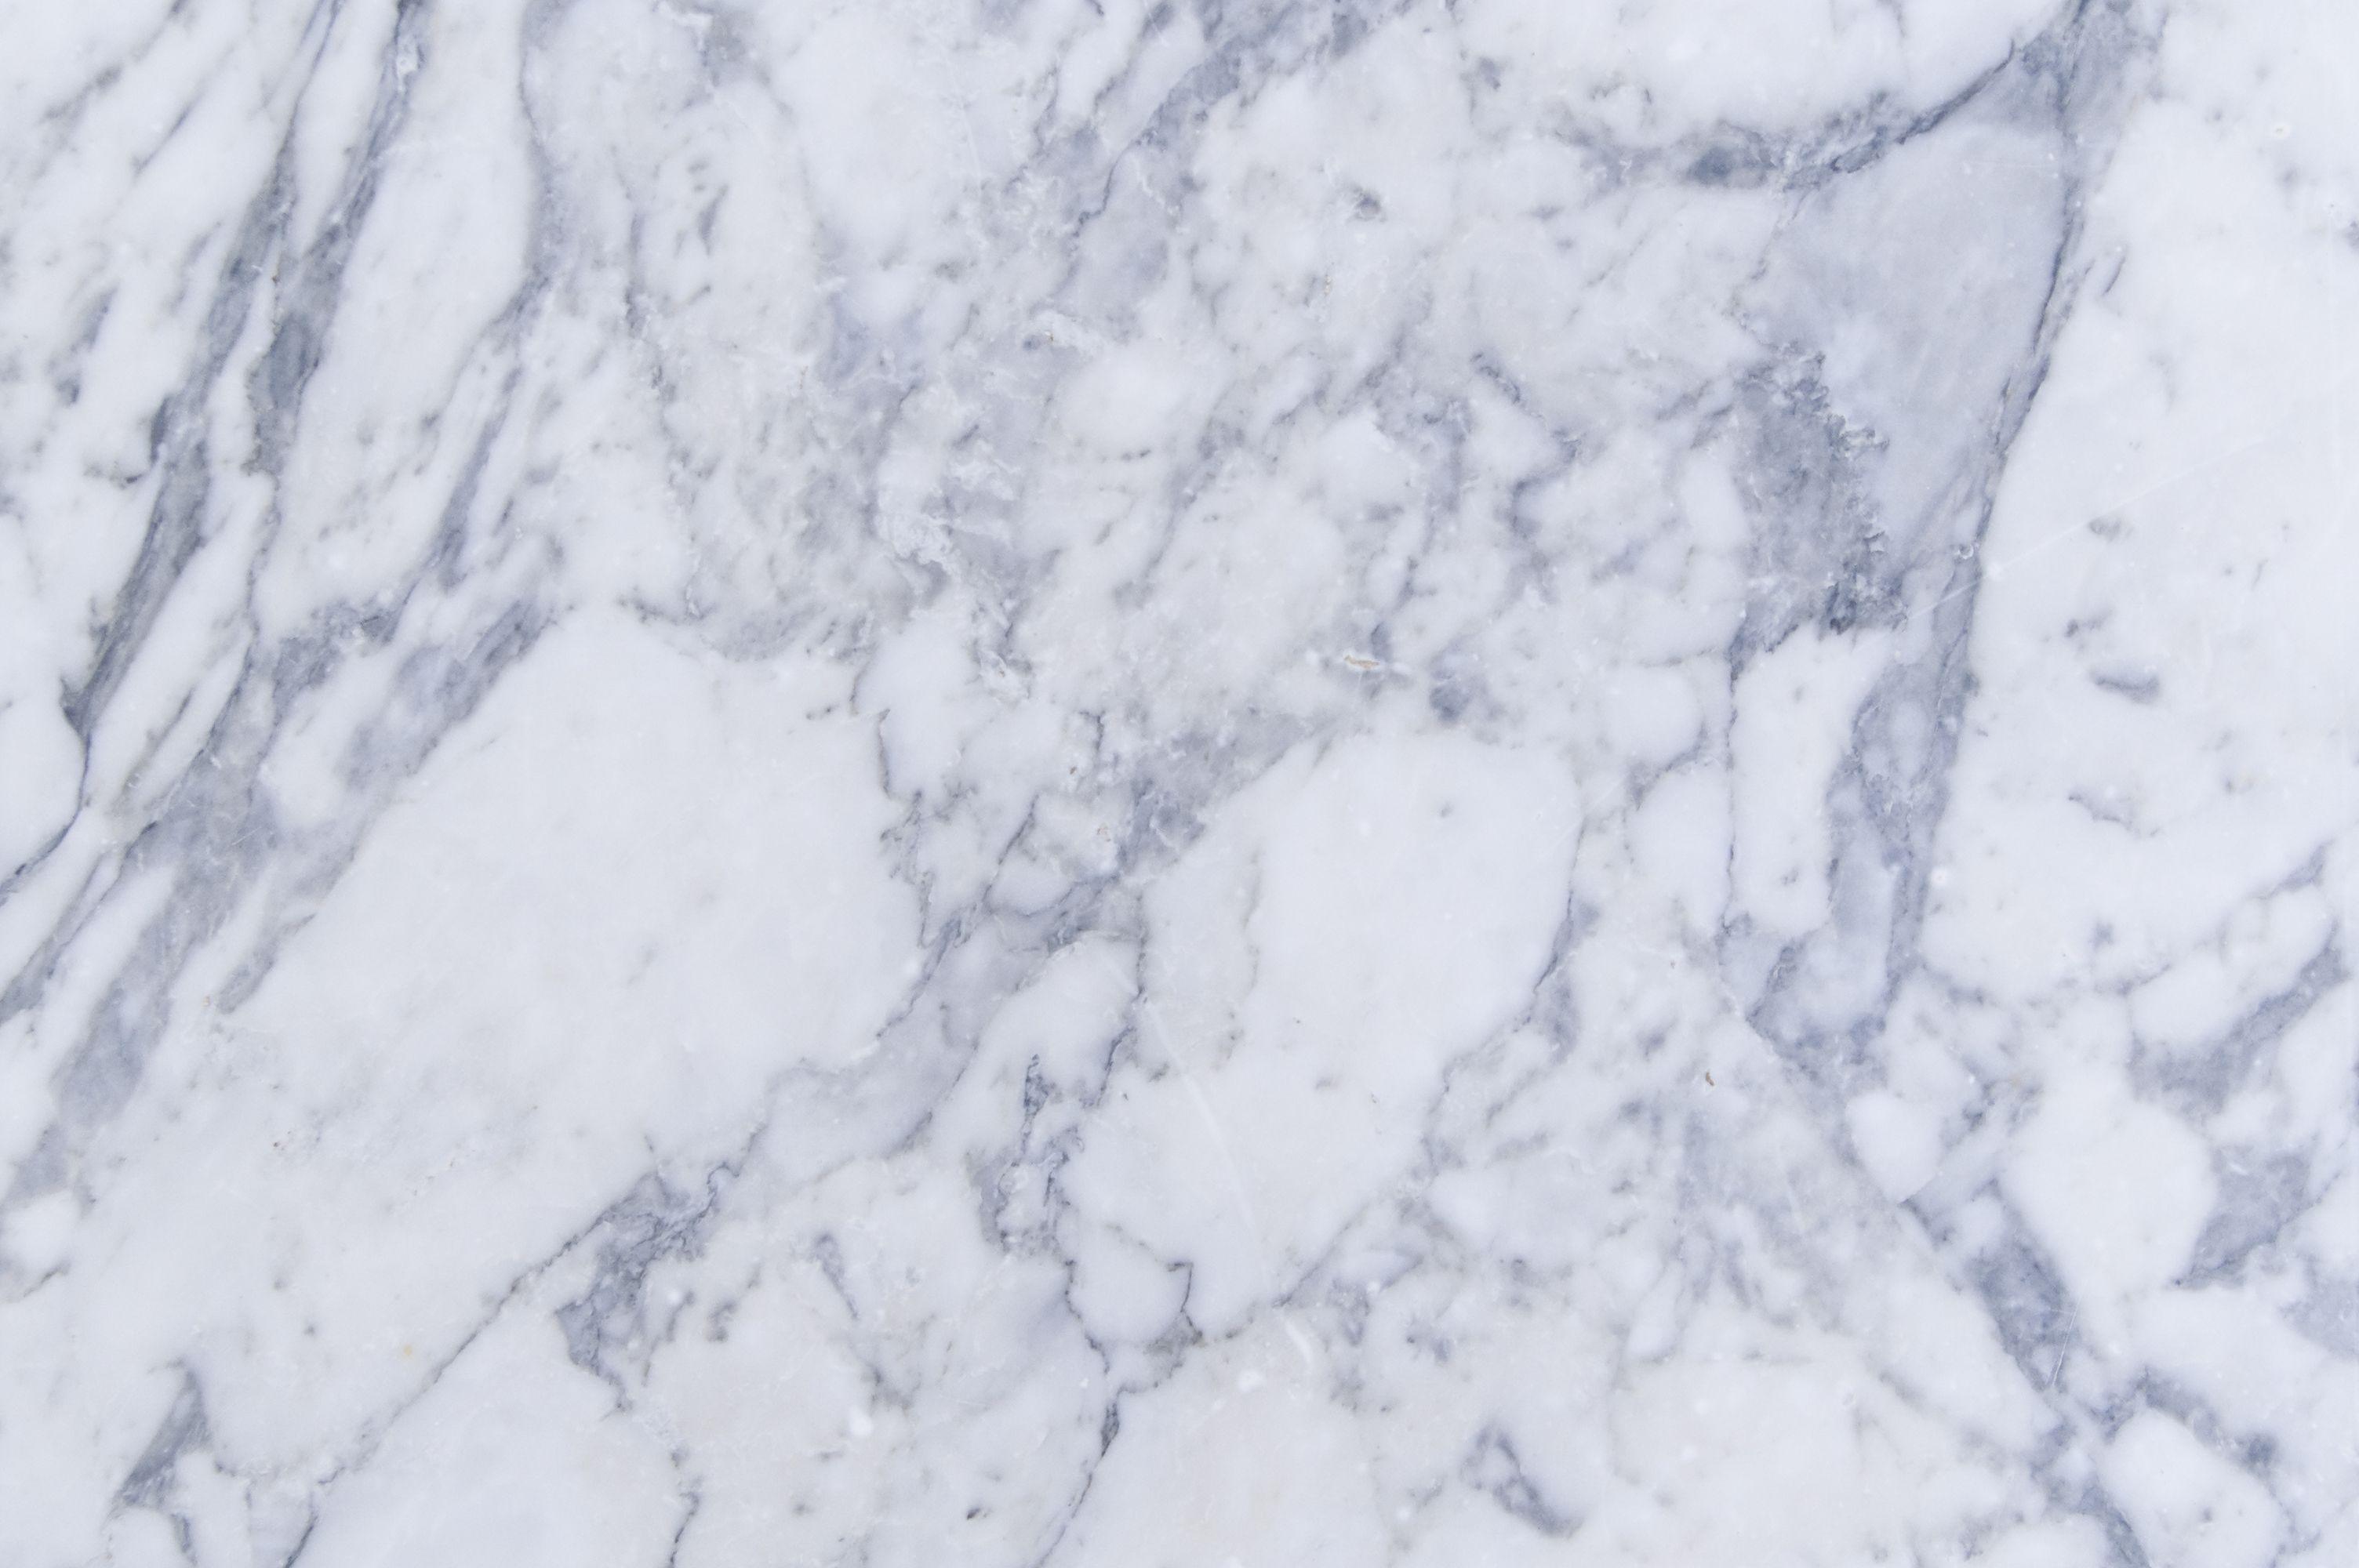 Pastel Marble Laptop Wallpapers Top Free Pastel Marble Laptop Backgrounds Wallpaperaccess Marble Macbook Blue Marble Wallpaper Marble Wallpaper